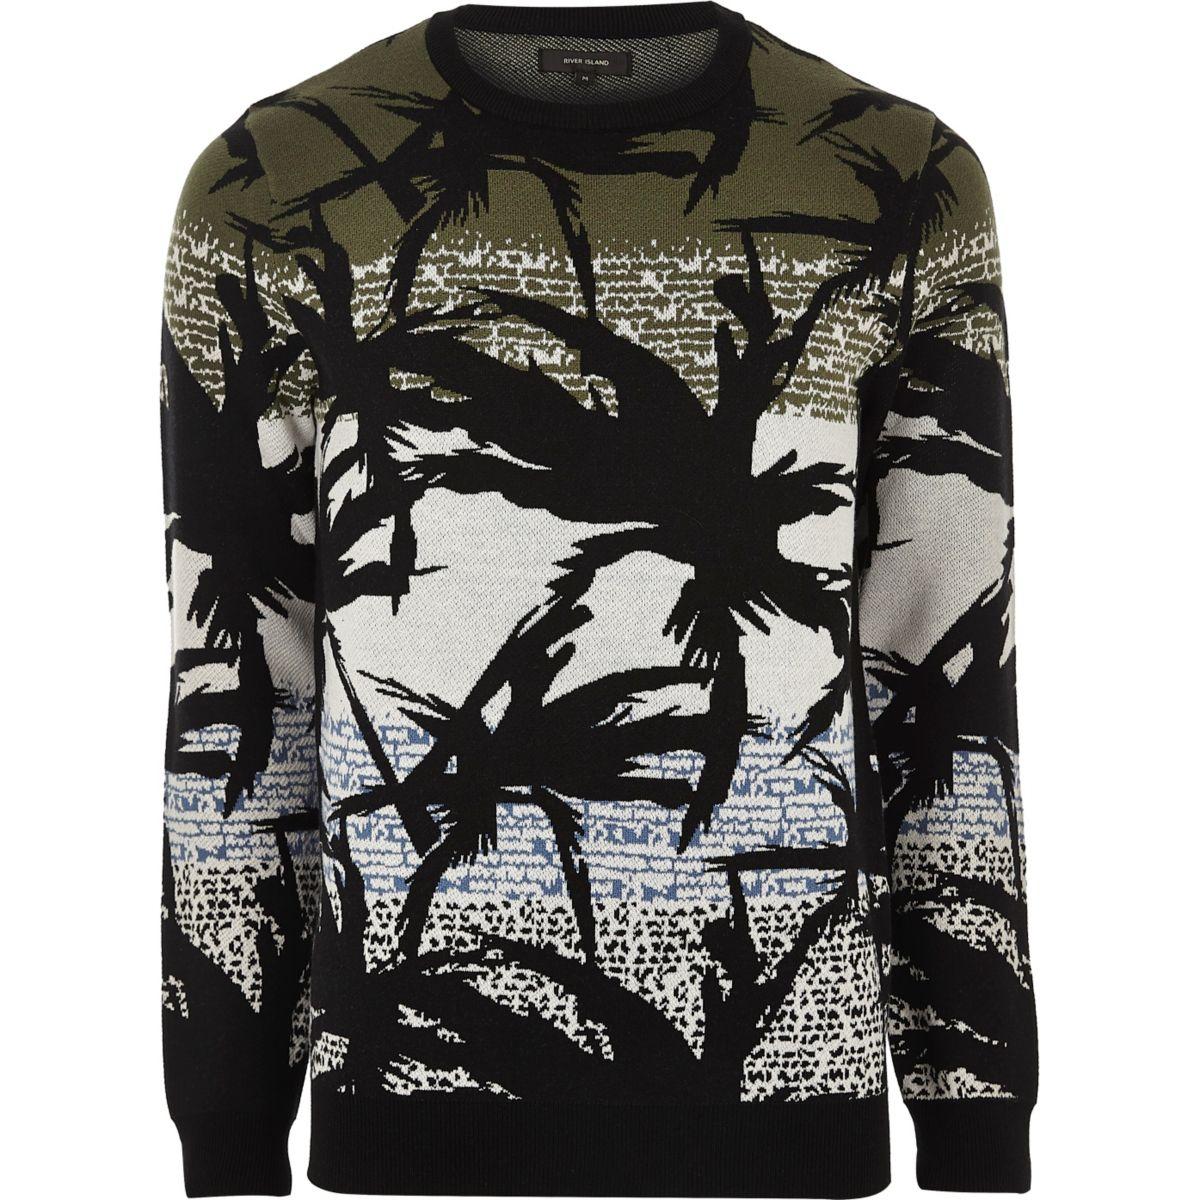 Green palm print sweater